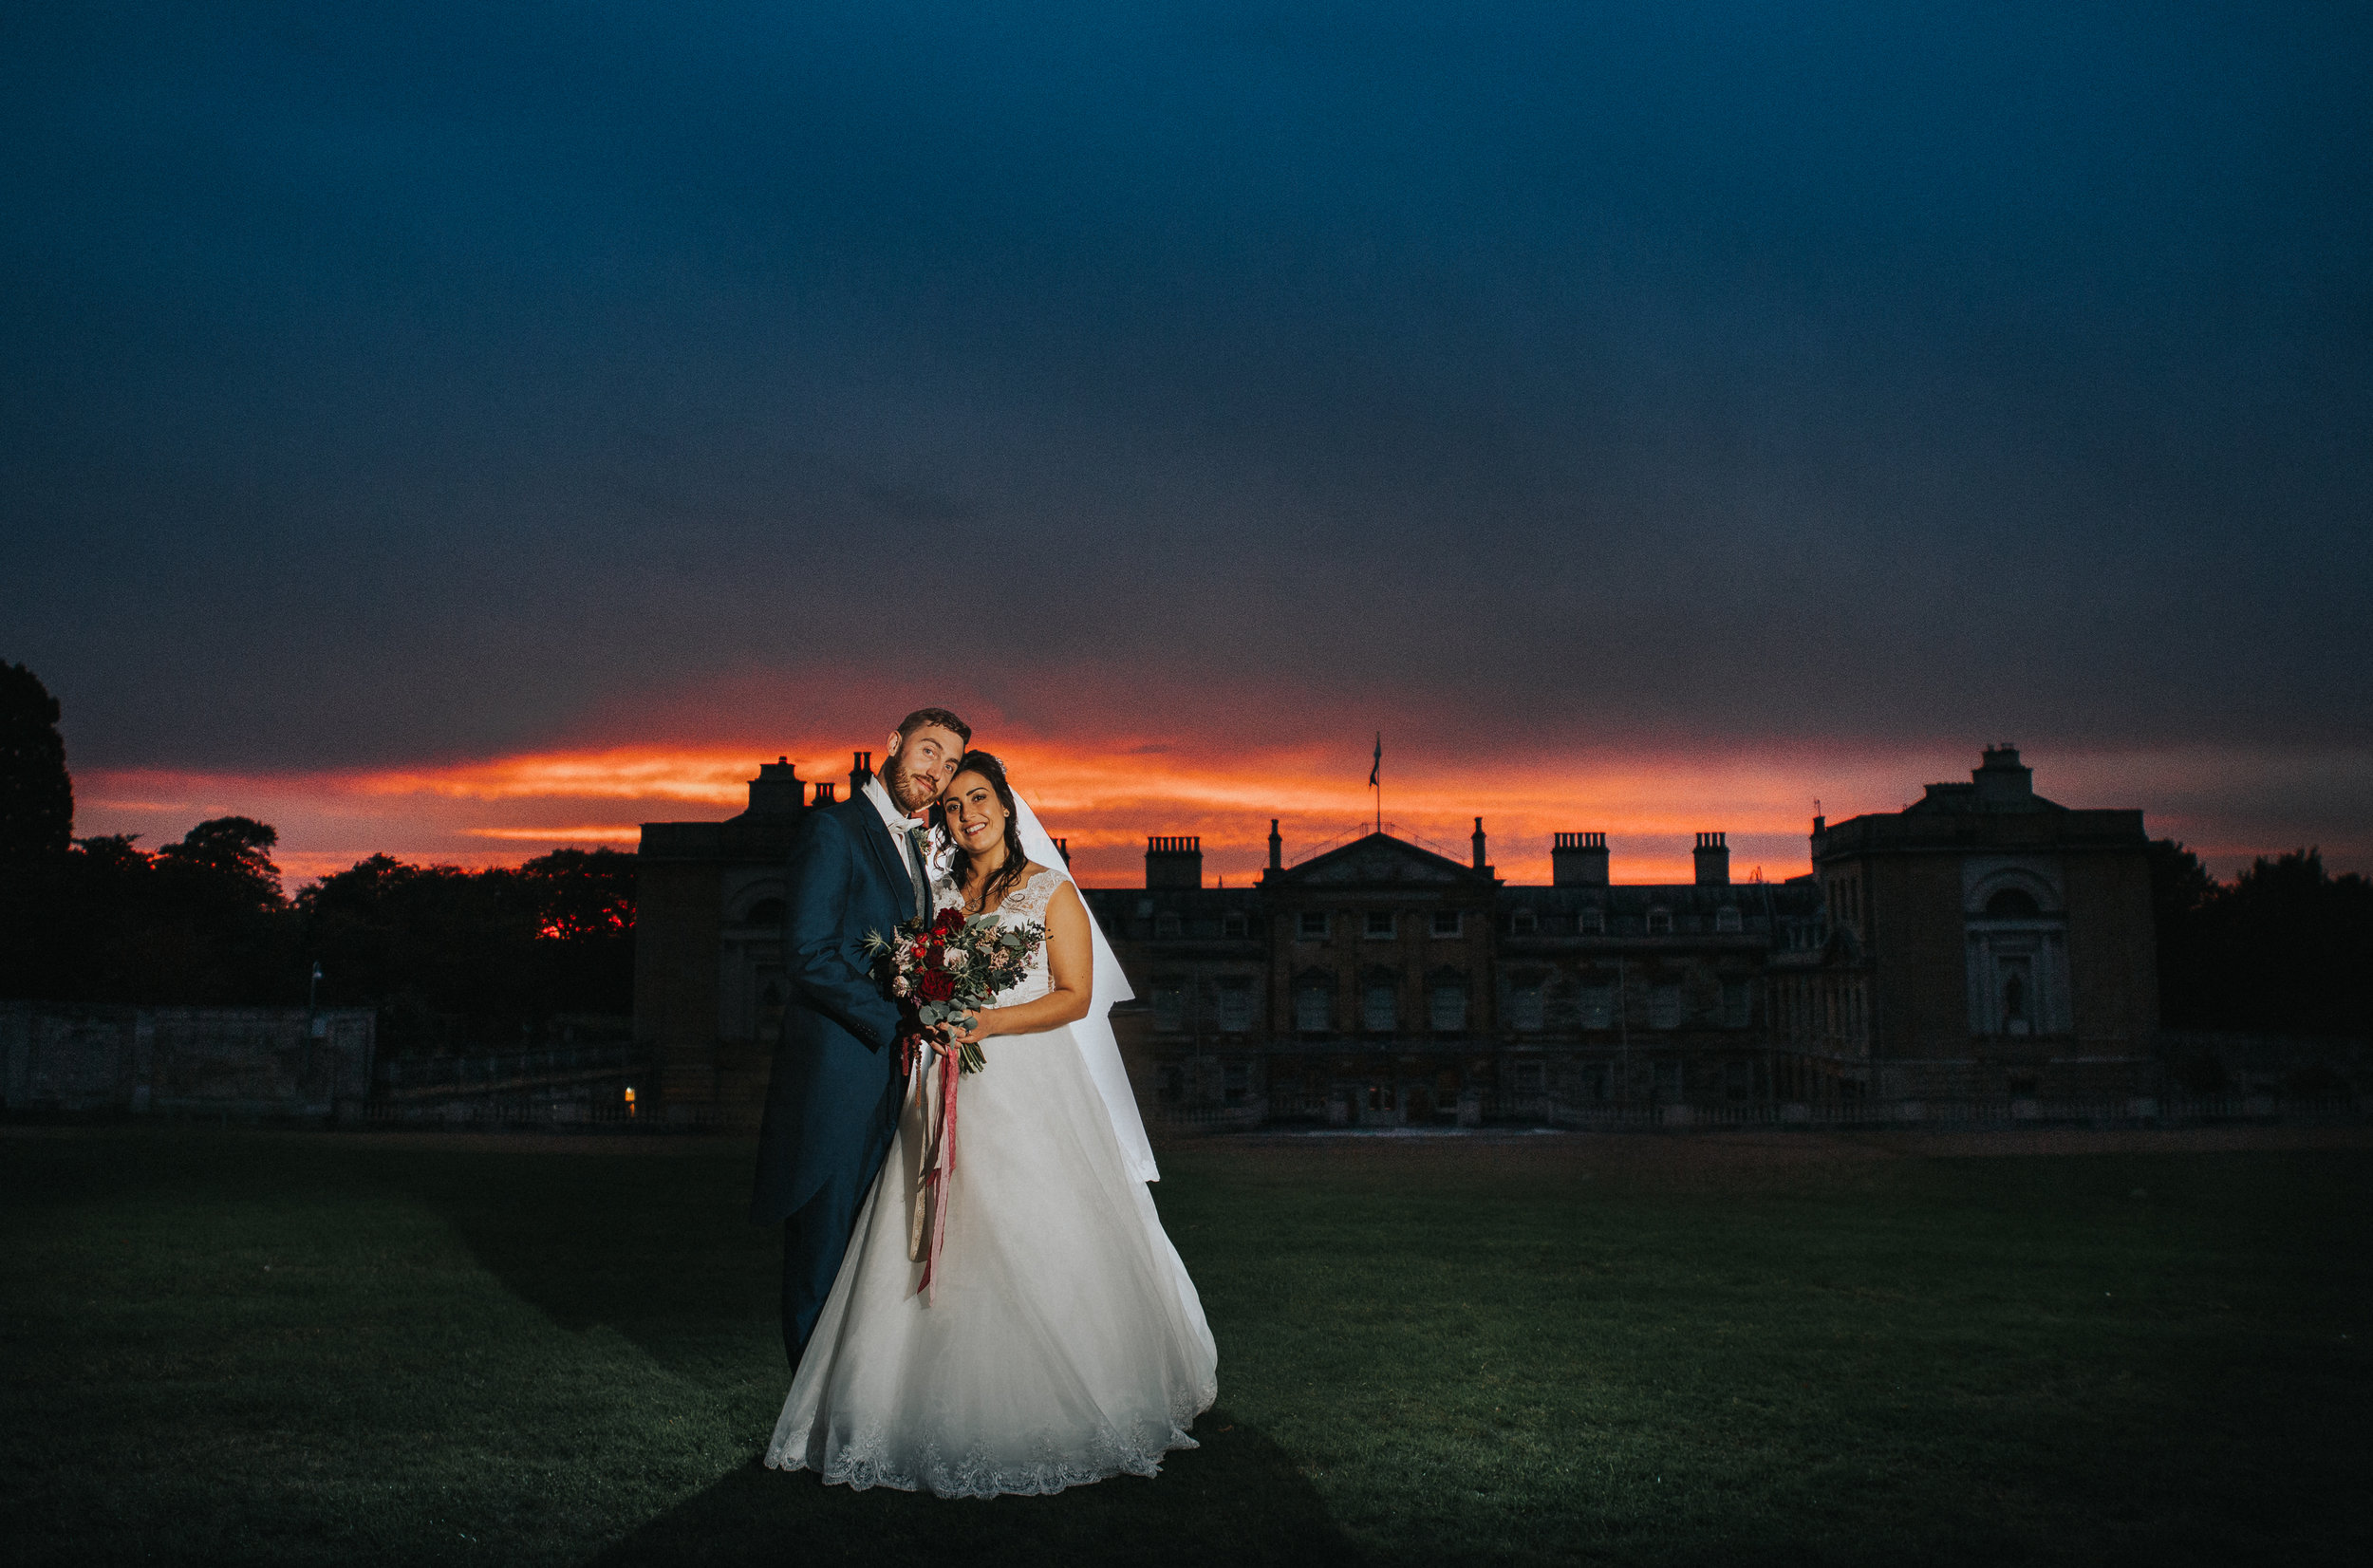 london-bedfordshire-uk-wedding-photography-woburn-sculpture-gallery-bridal-portrait-sunset-76